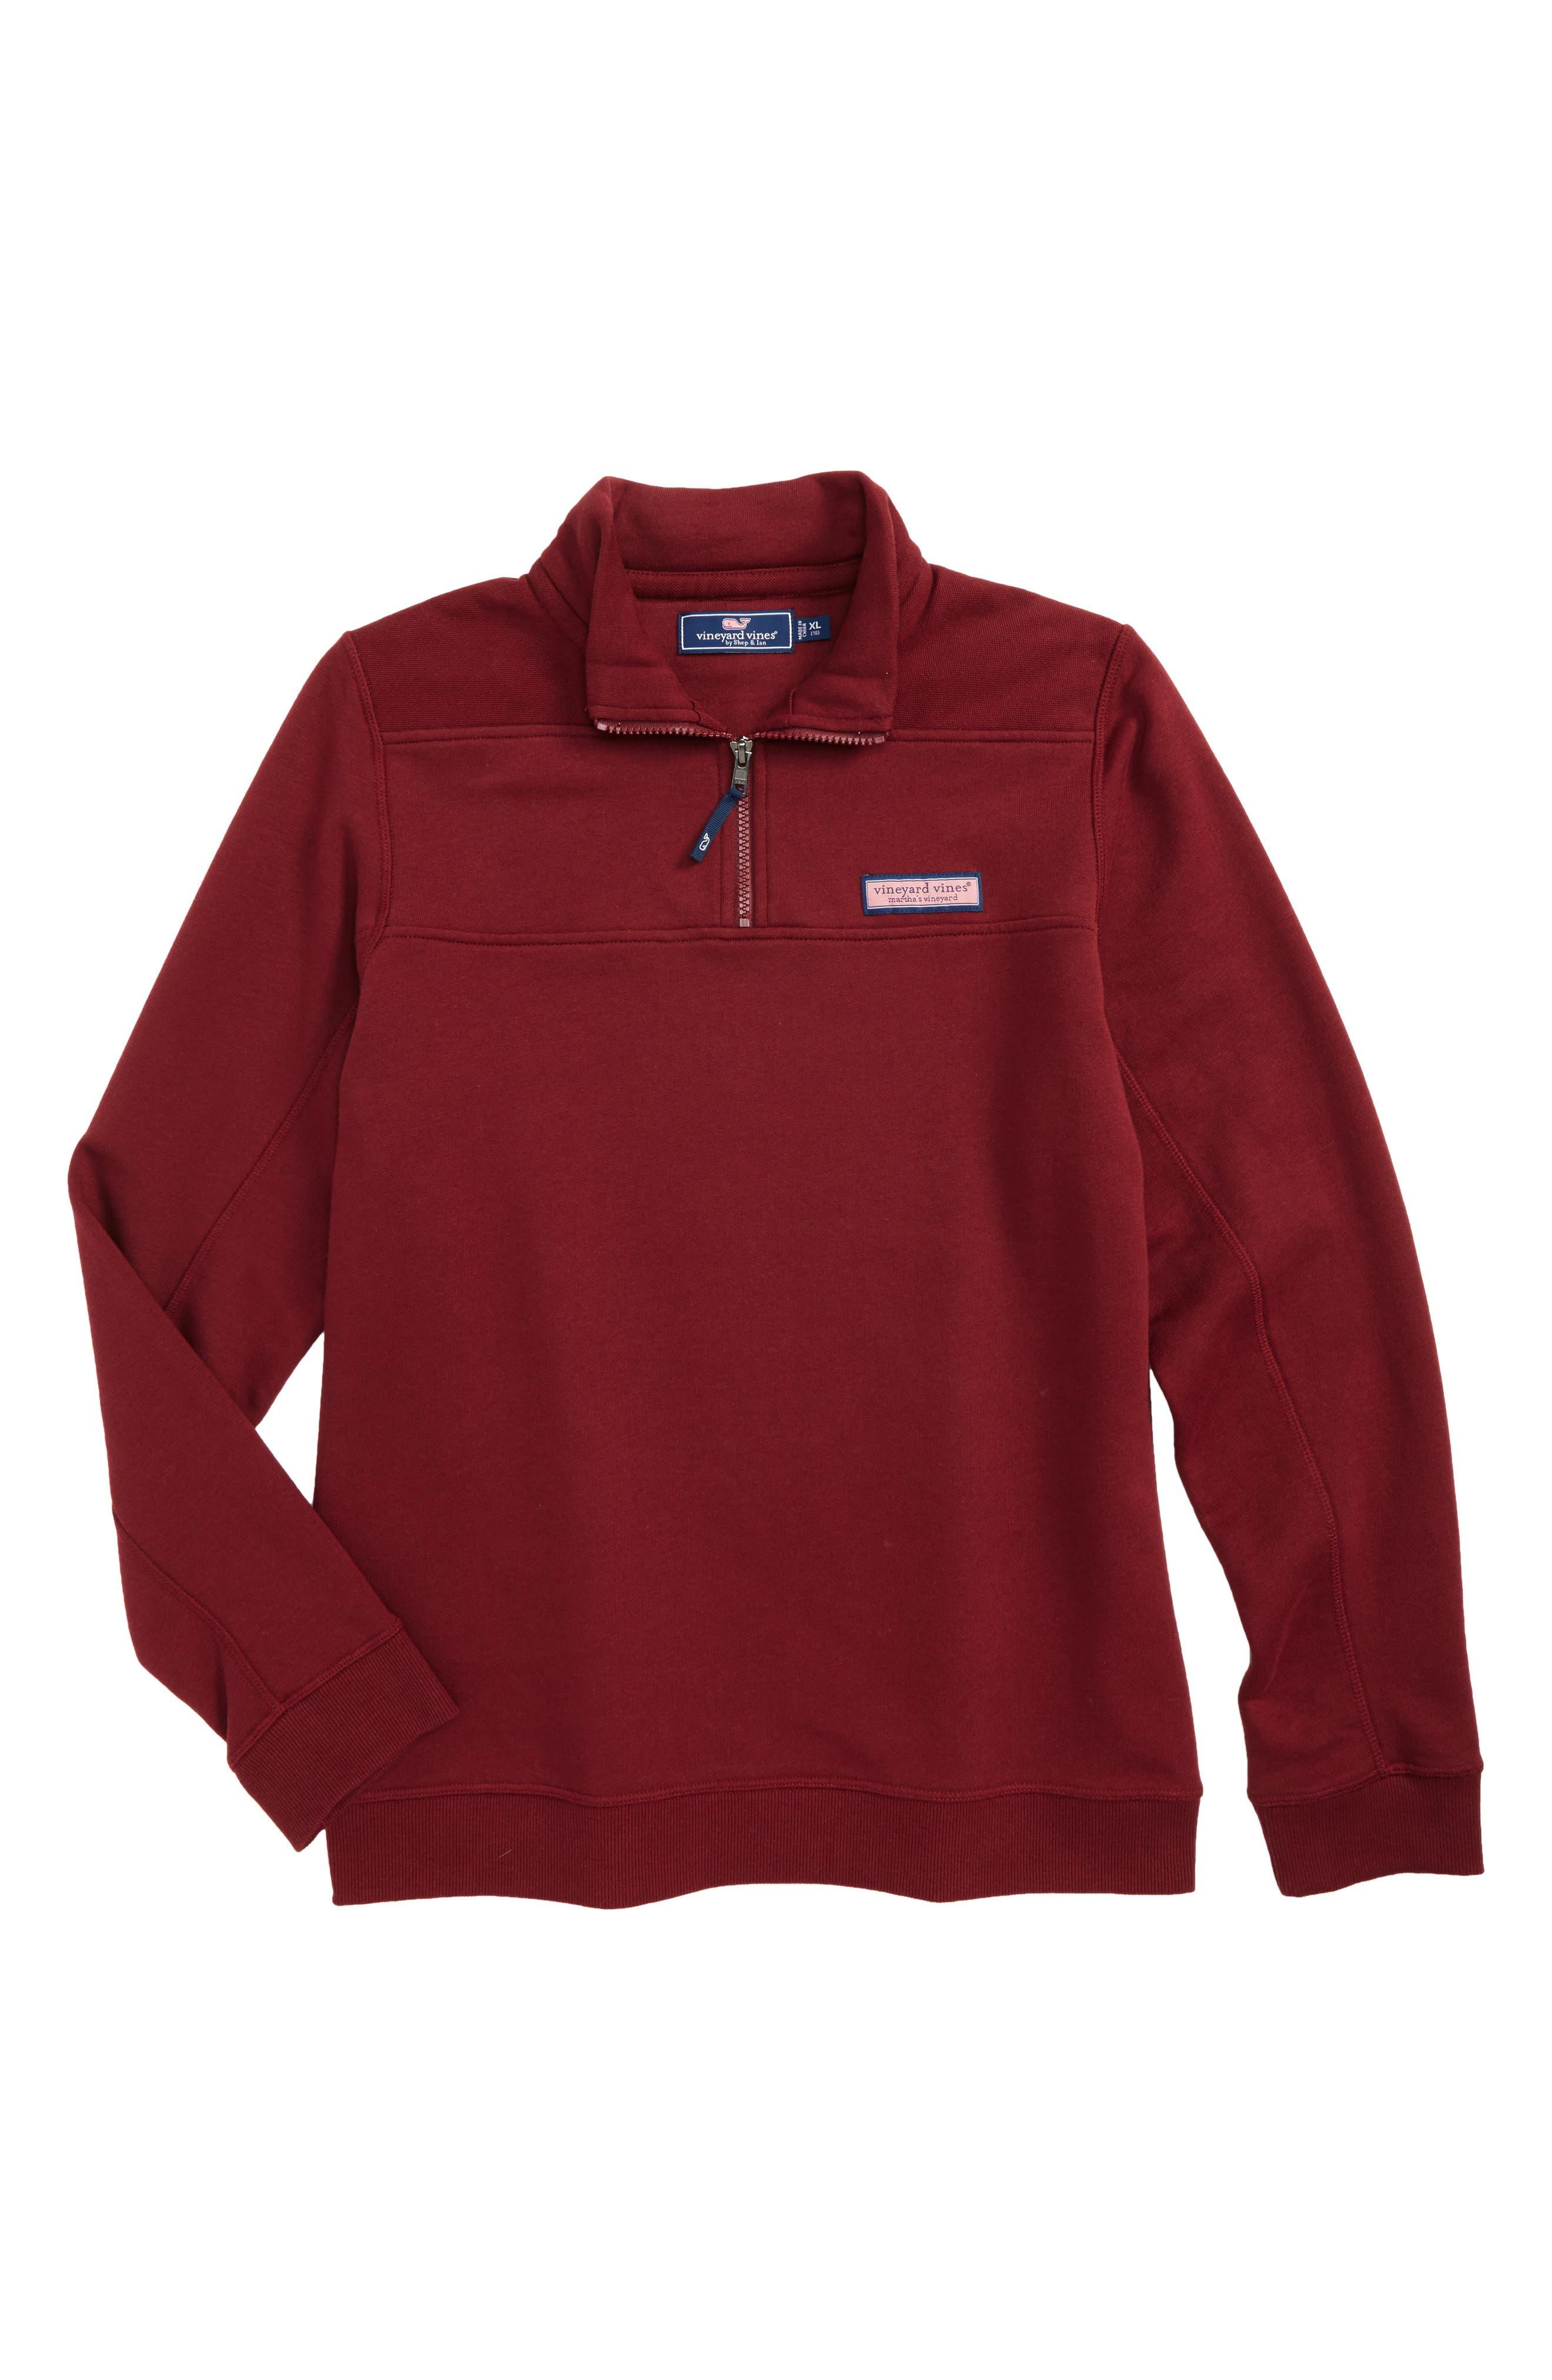 Boys Vineyard Vines Classic Shep Quarter Zip Pullover Size XL (18)  Burgundy